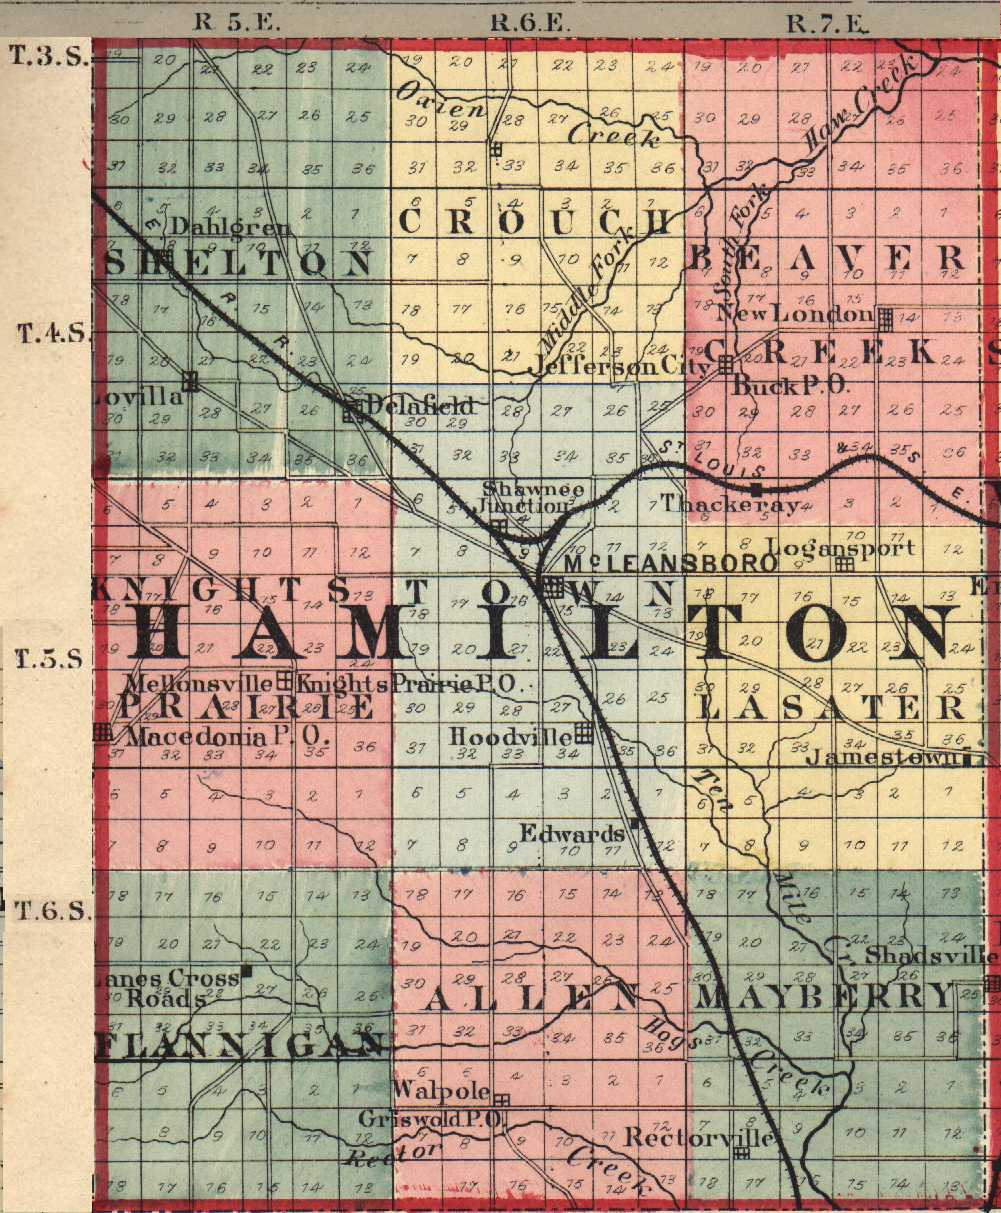 Hamilton County Illinois Maps And Gazetteers